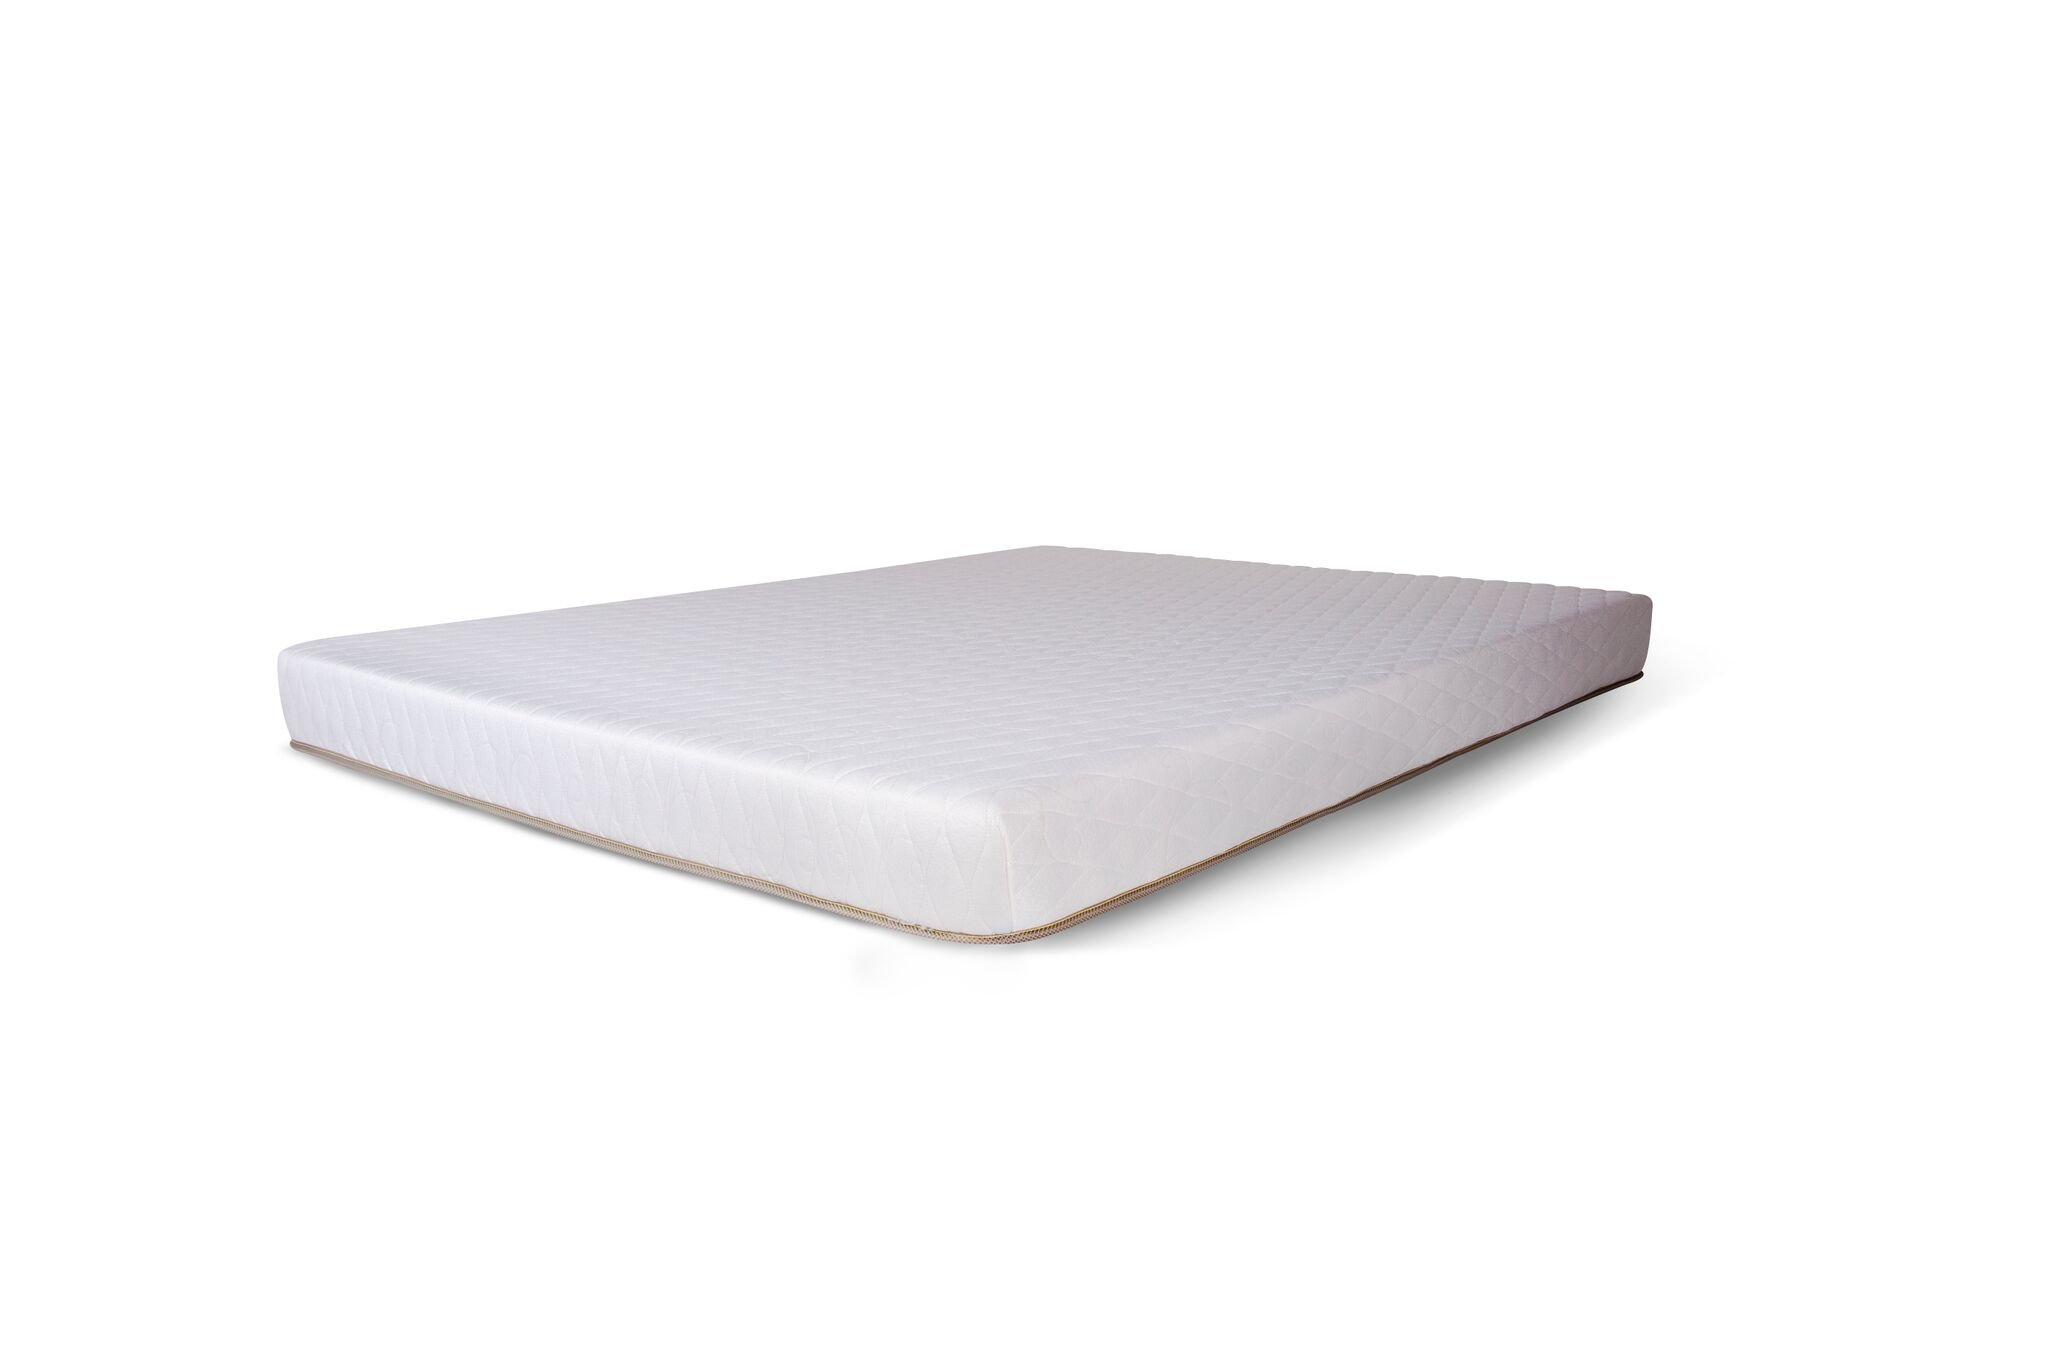 Dreamfoam Bedding Chill 6'' Gel Memory Foam Mattress, Full, Made in The USA by Dreamfoam Bedding